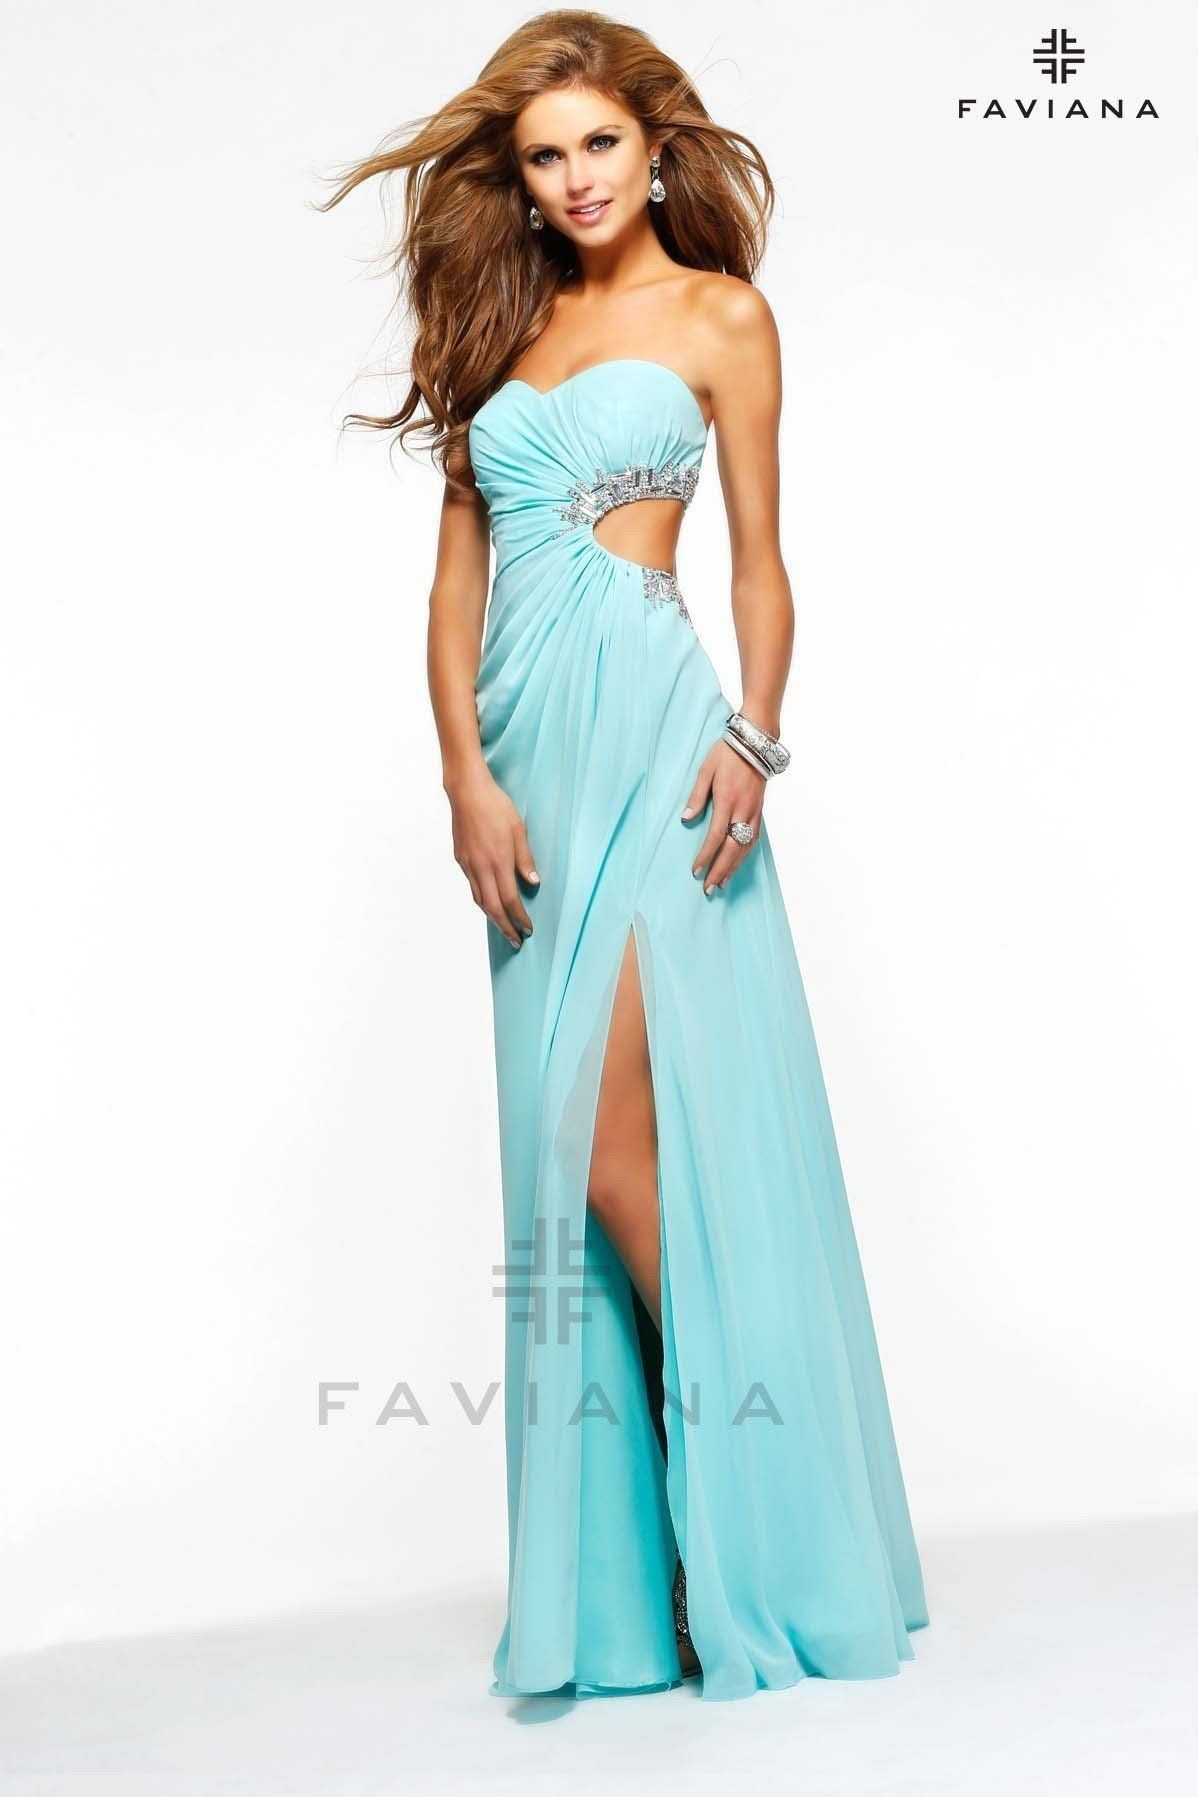 chiffon seafom faviana gown products pinterest prom